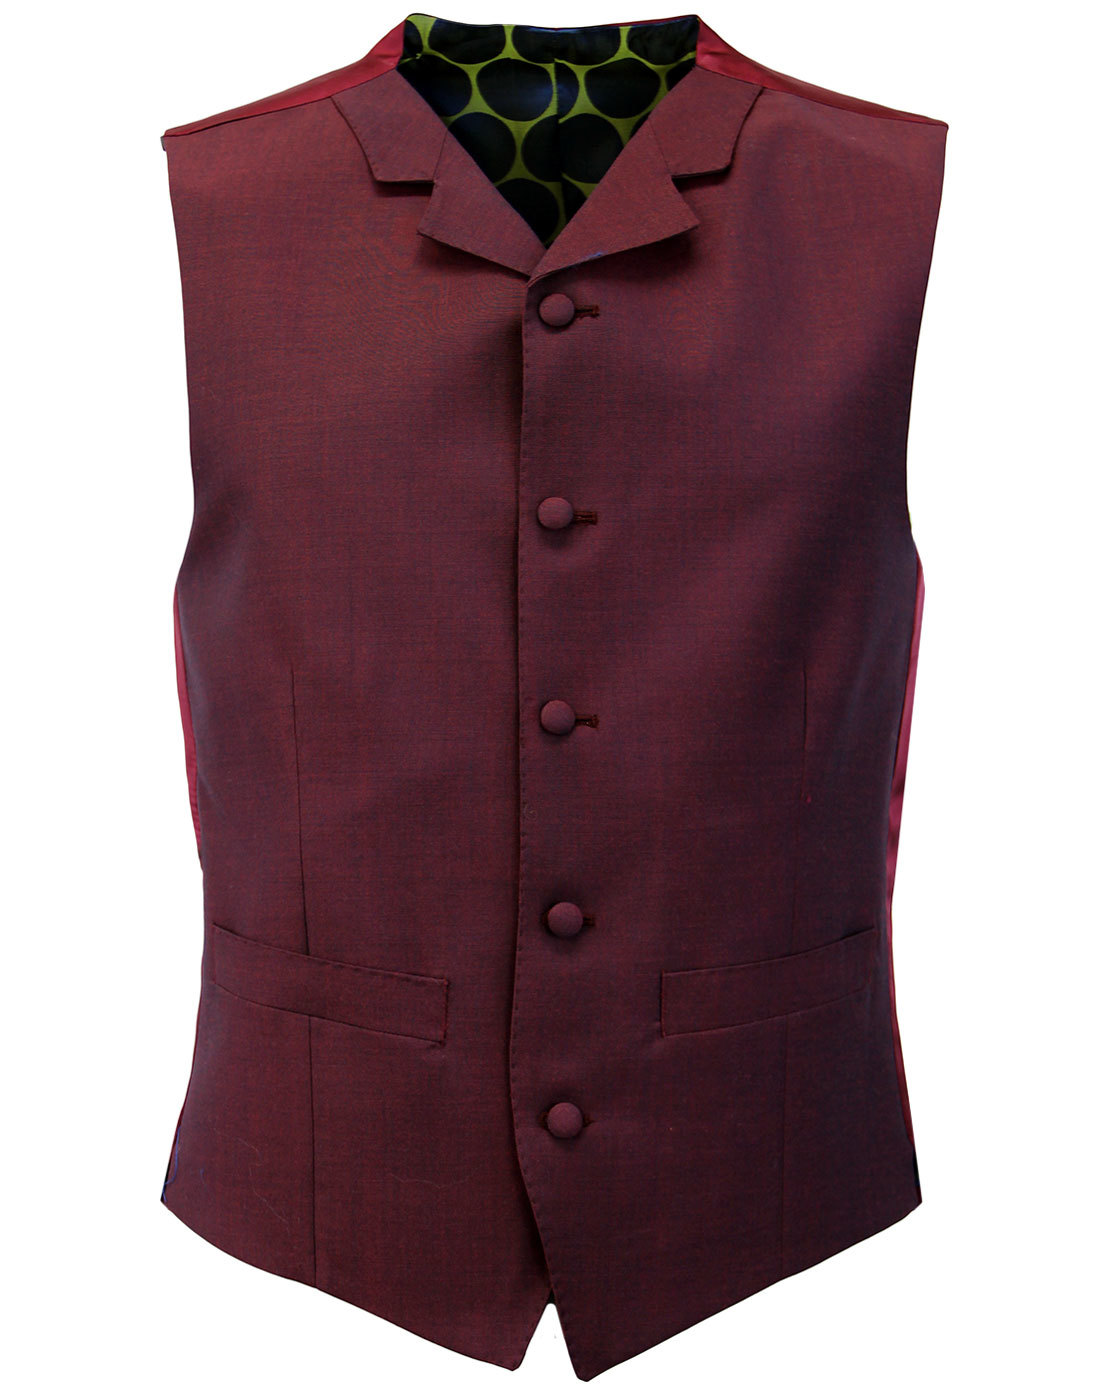 MADCAP ENGLAND Mod Mohair Burgundy Tonic Waistcoat